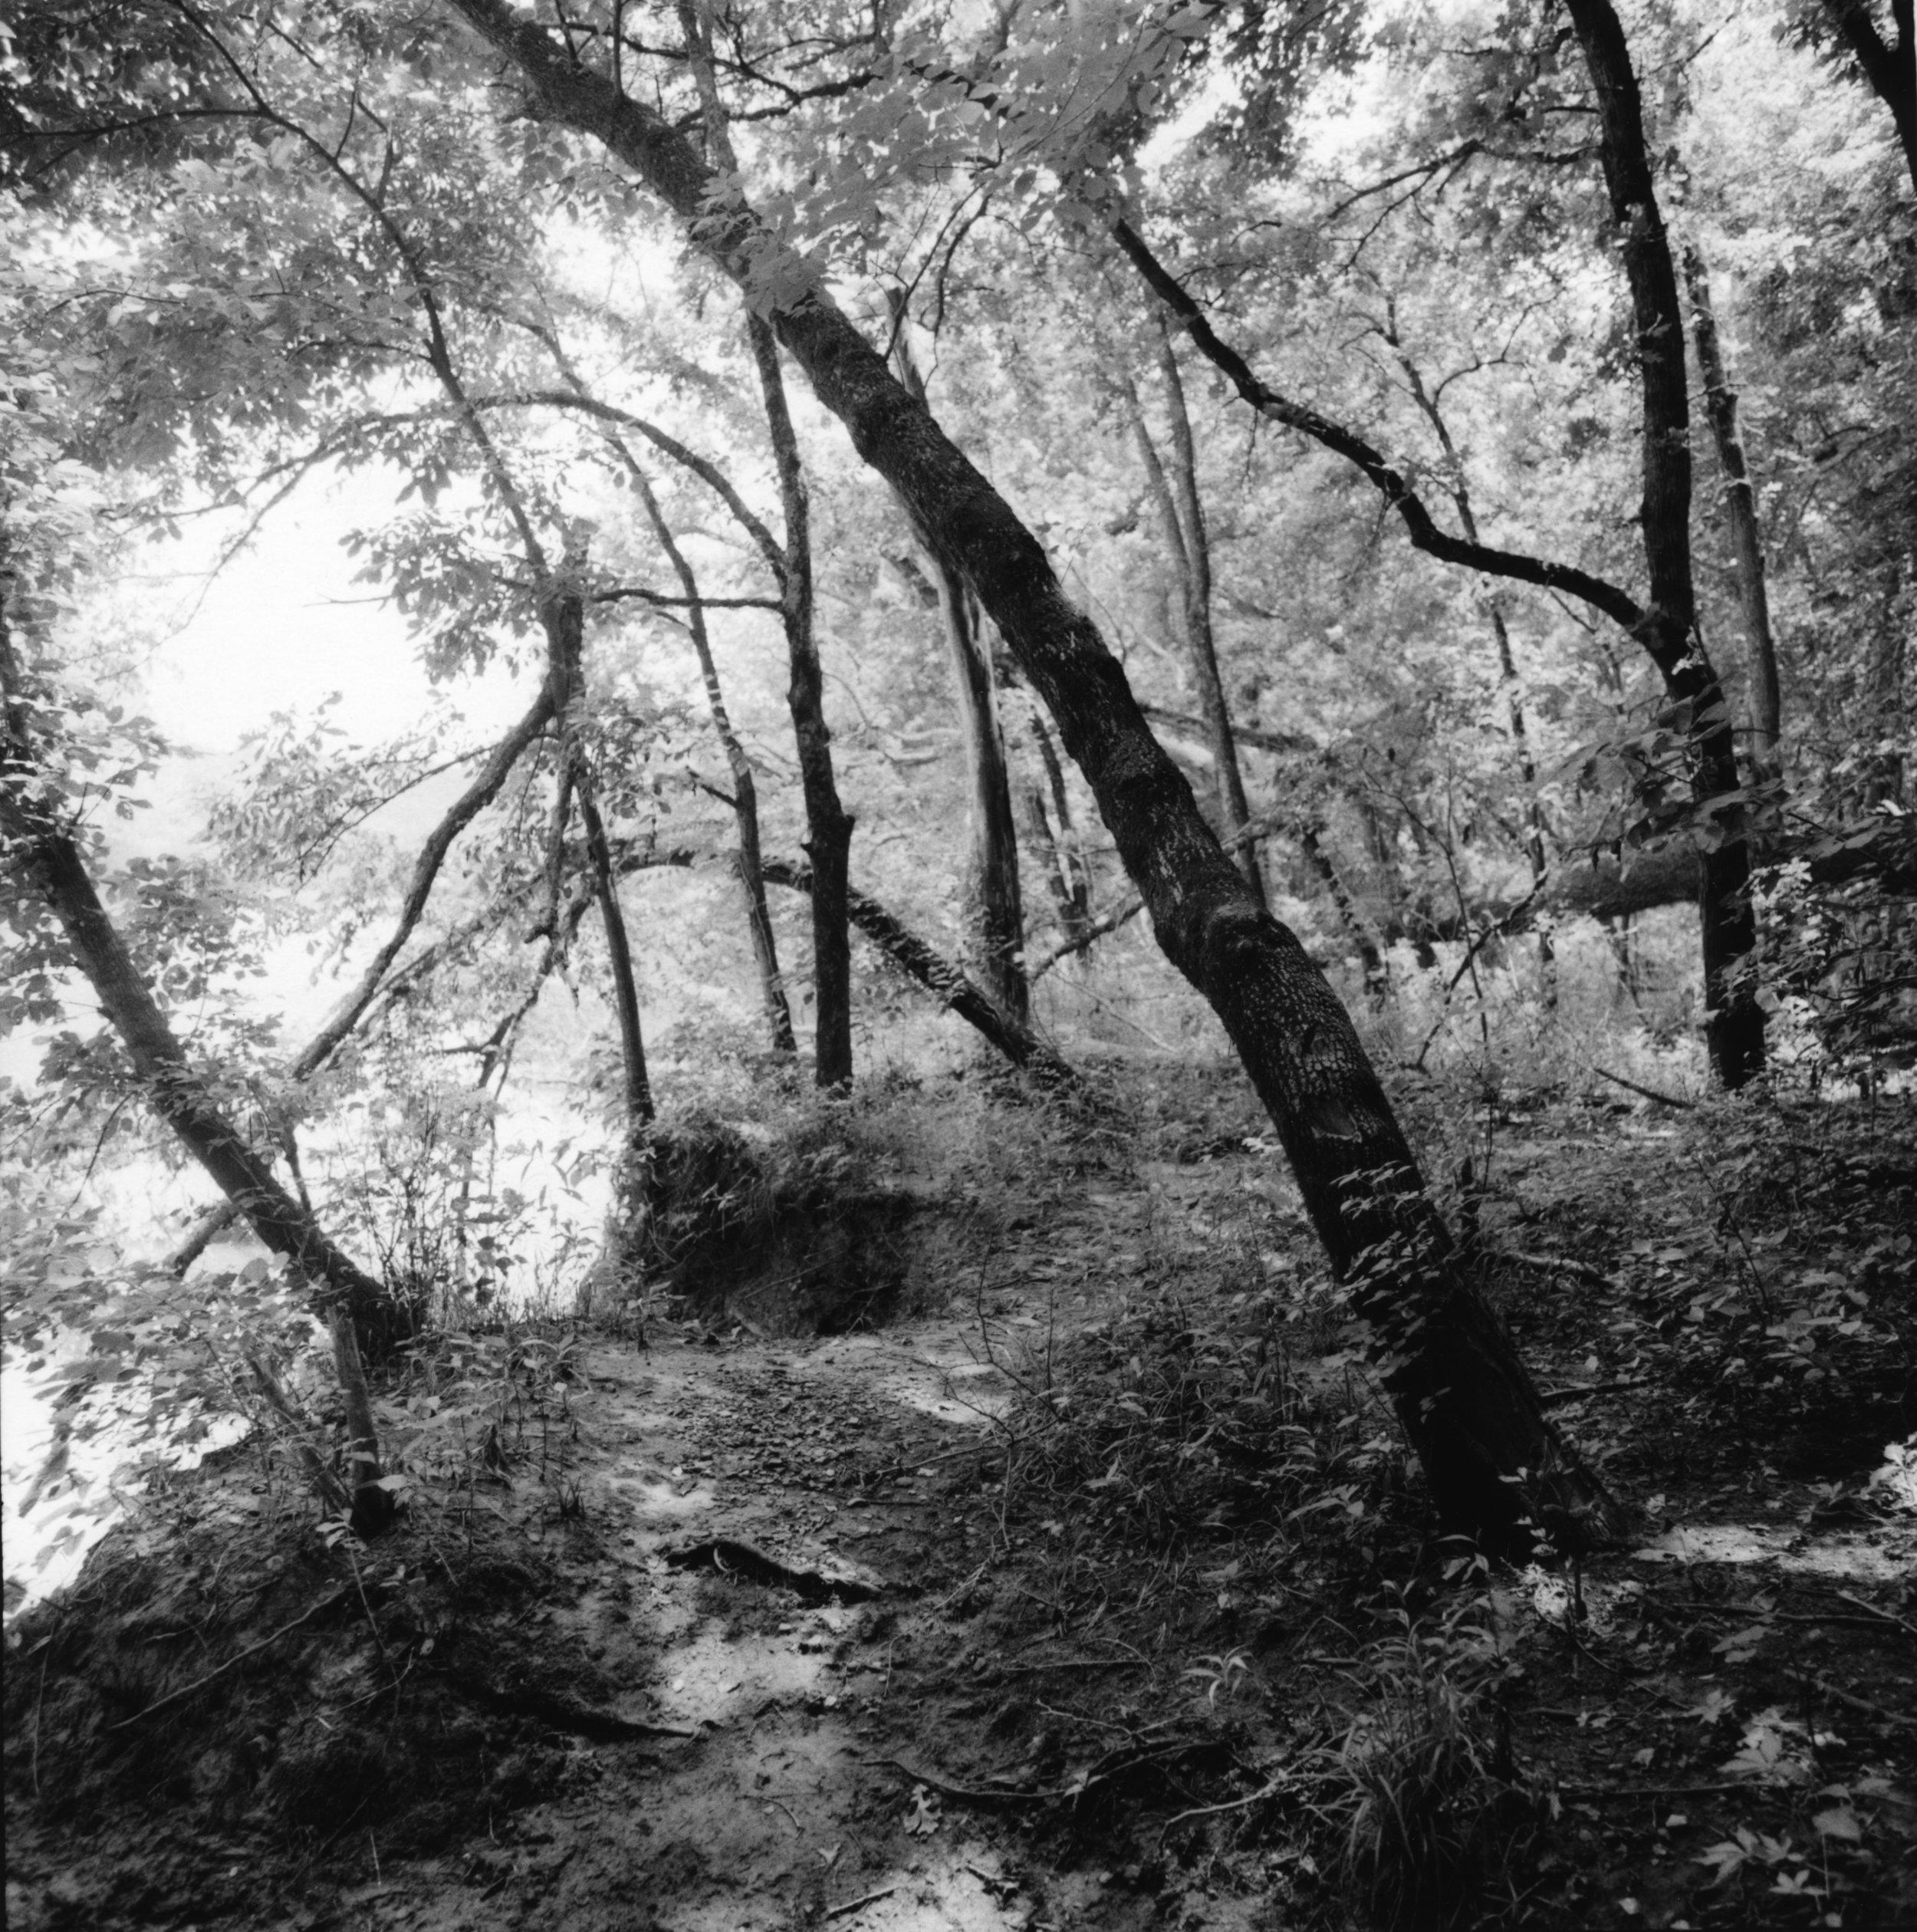 Cabin Creek, Oklahoma, 1999